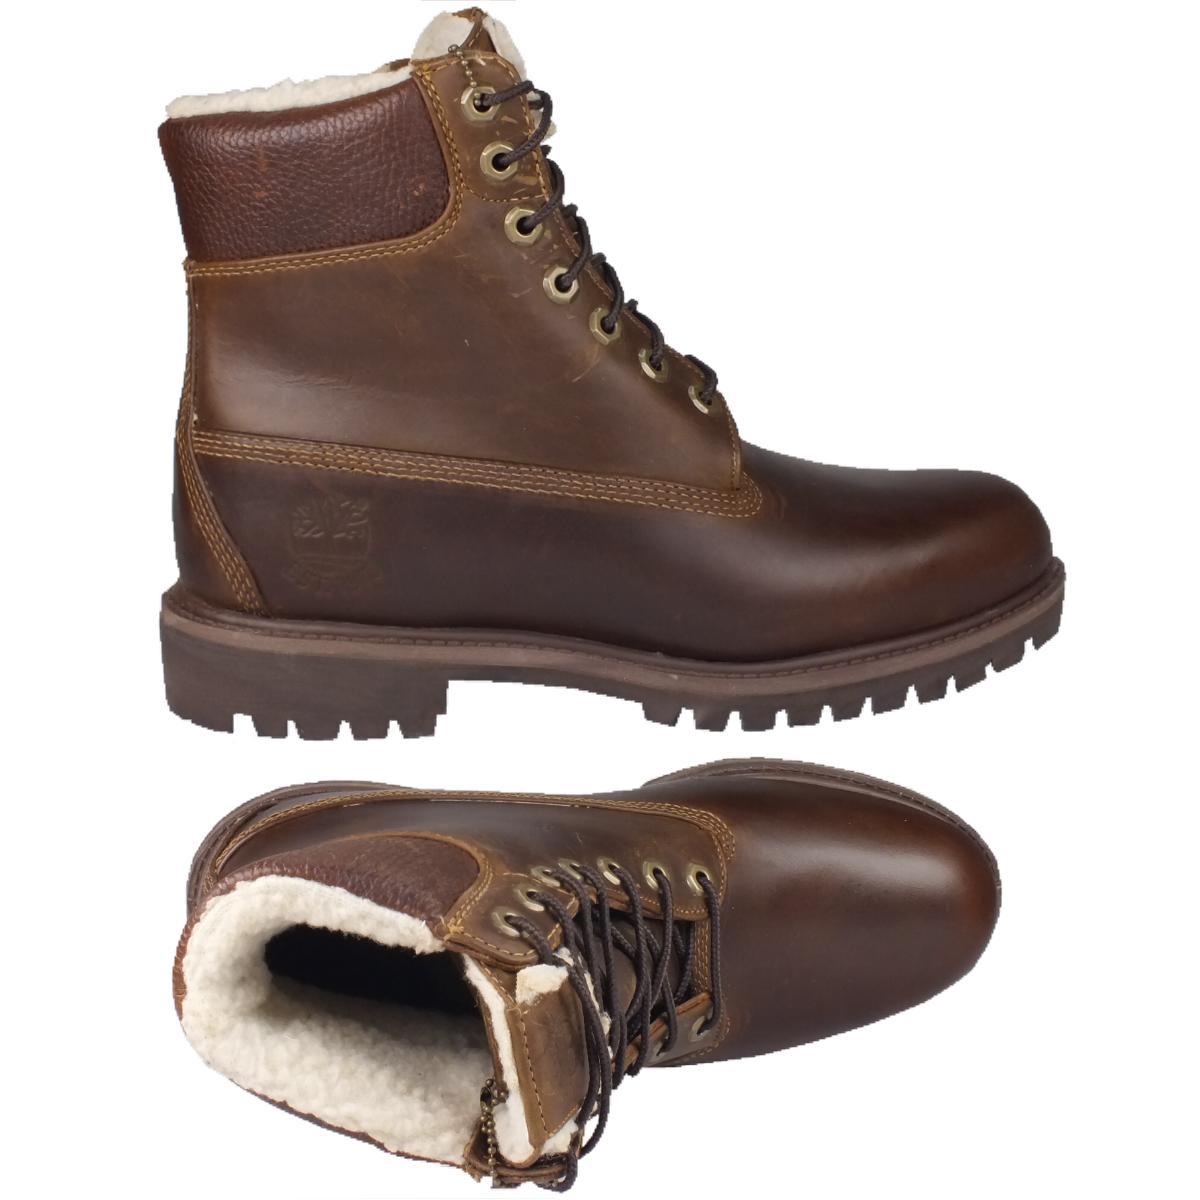 timberland 6 inch fleece boots herren schuhe stiefel. Black Bedroom Furniture Sets. Home Design Ideas